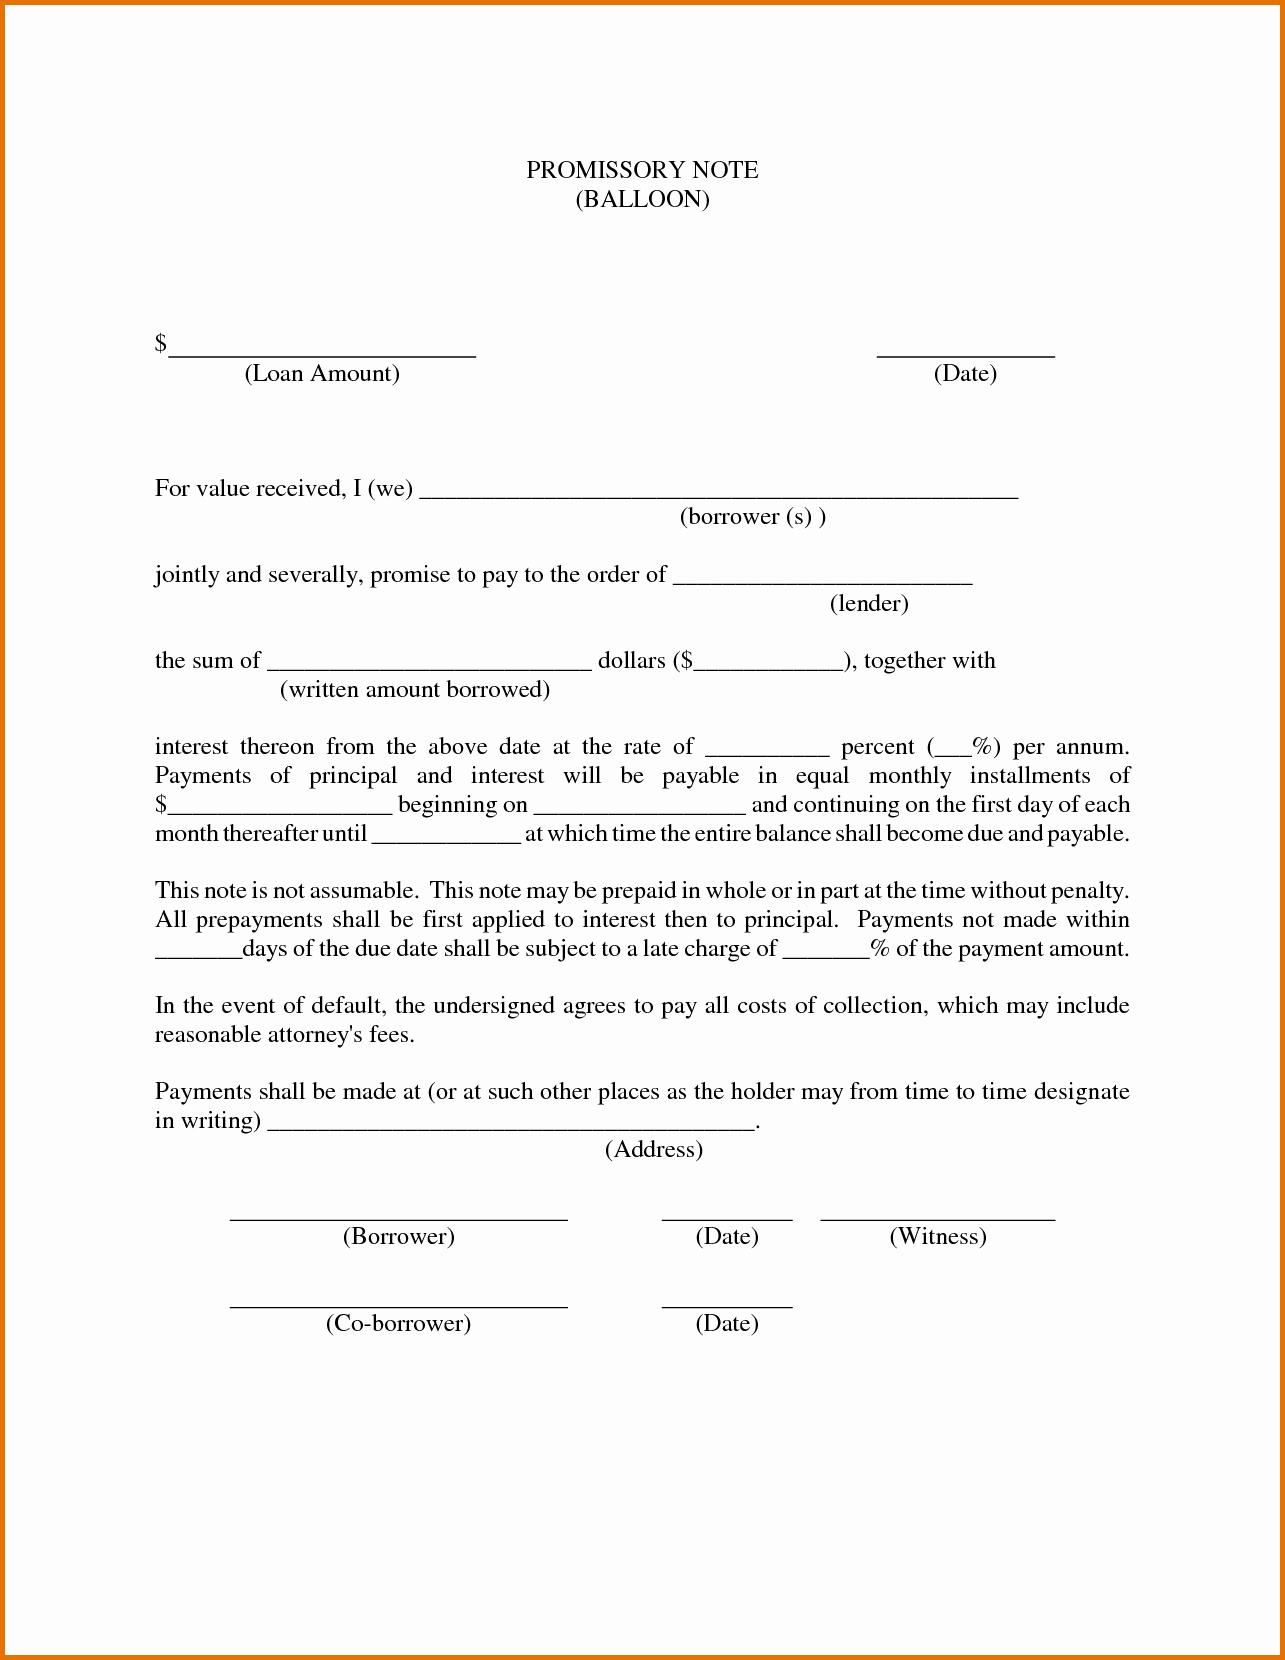 Promissory Note Free Download Portablegasgrillweber